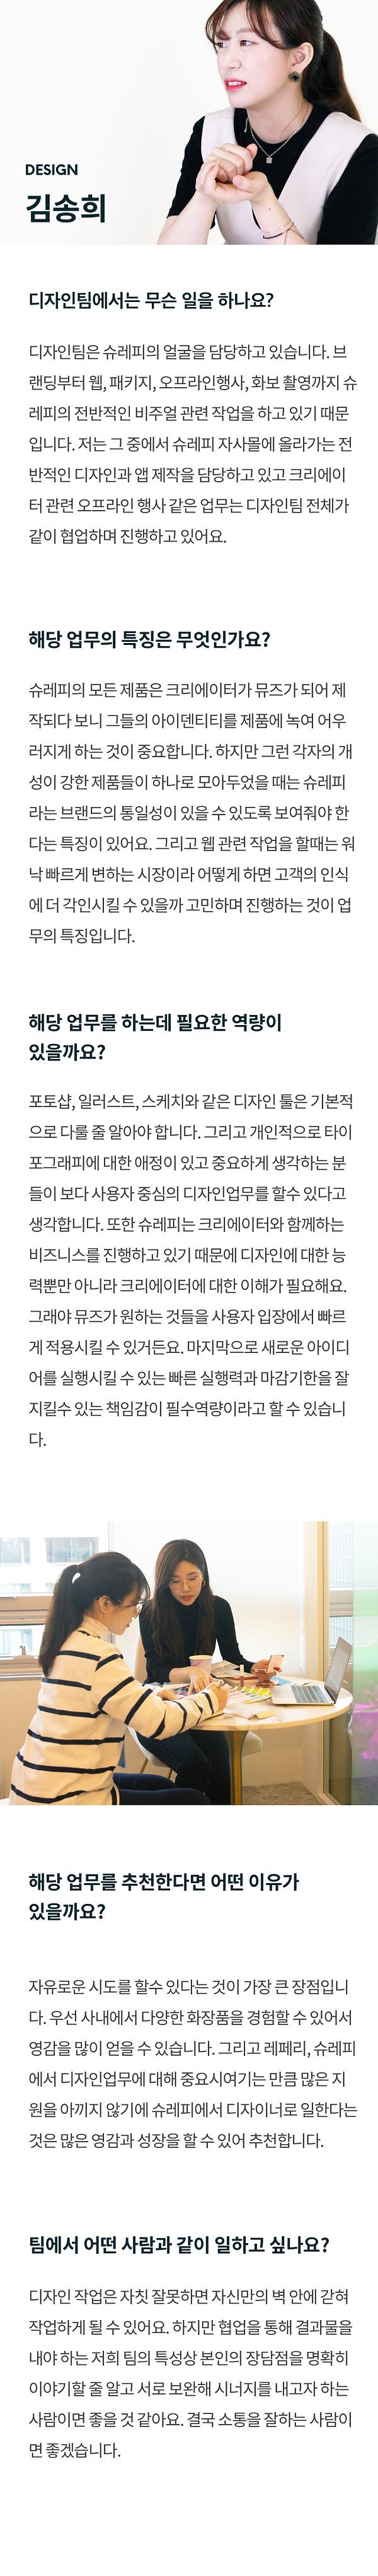 M_김송희.jpg